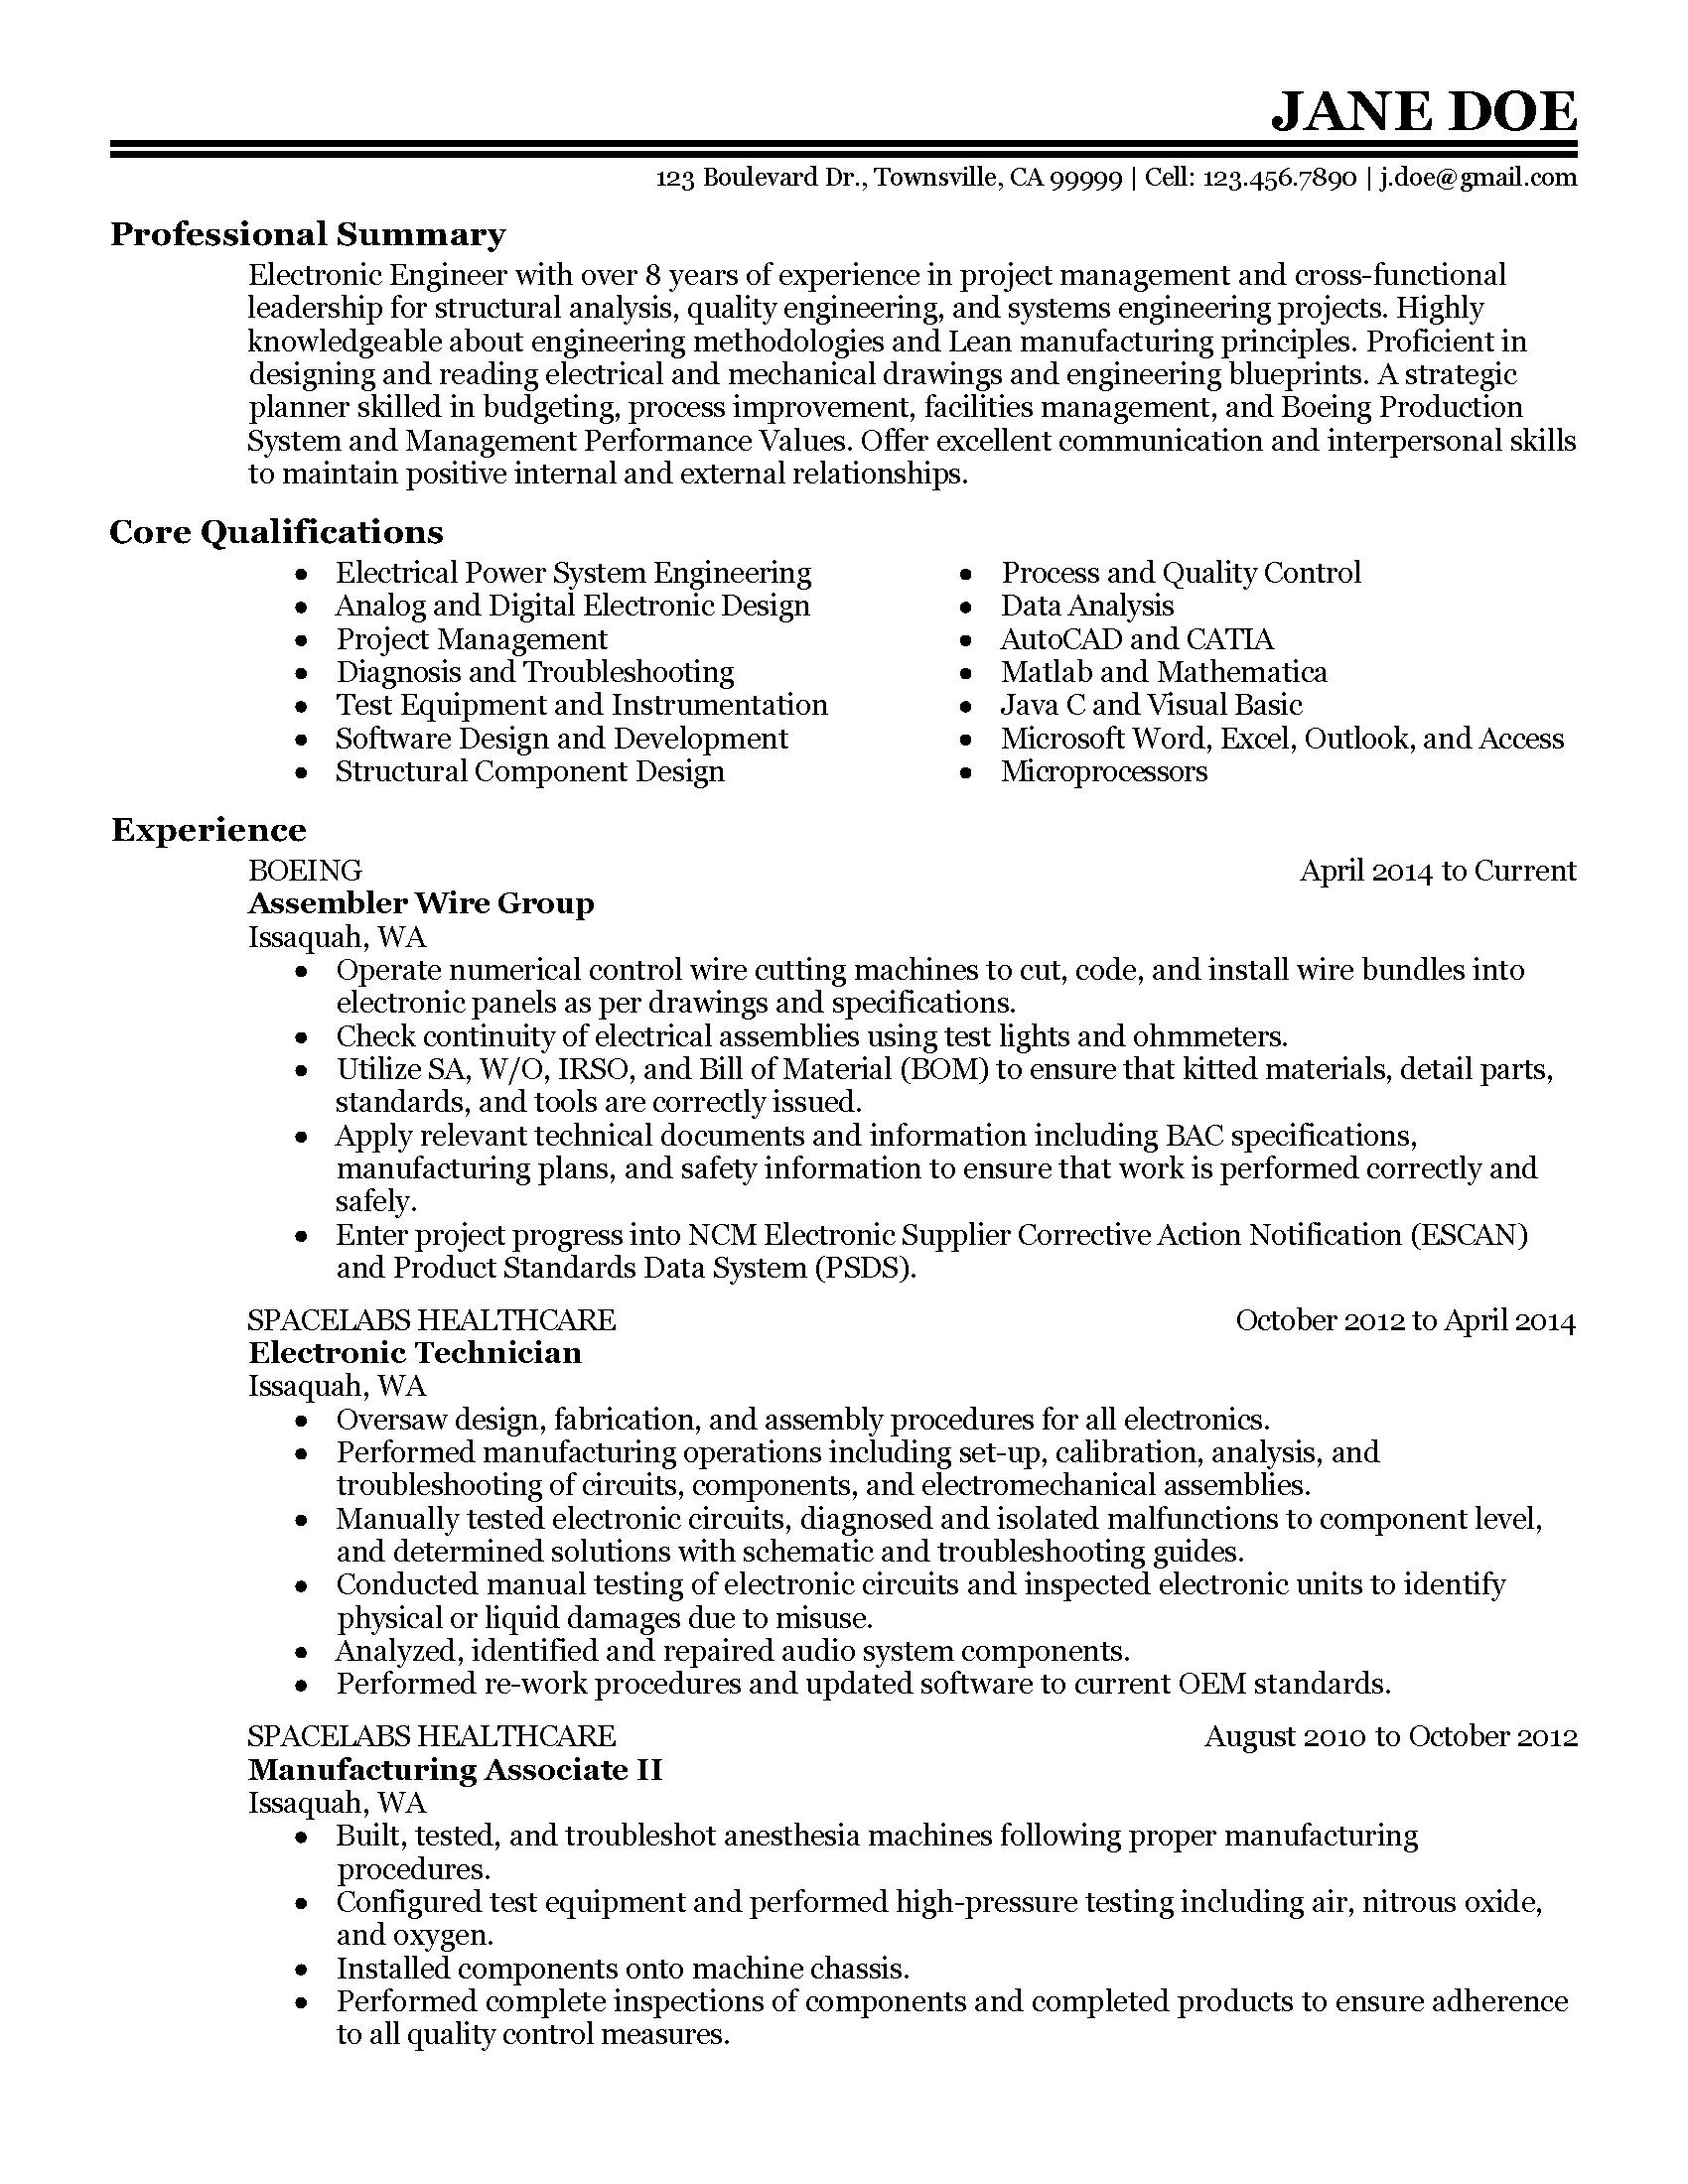 developmental engineer resume - April.onthemarch.co